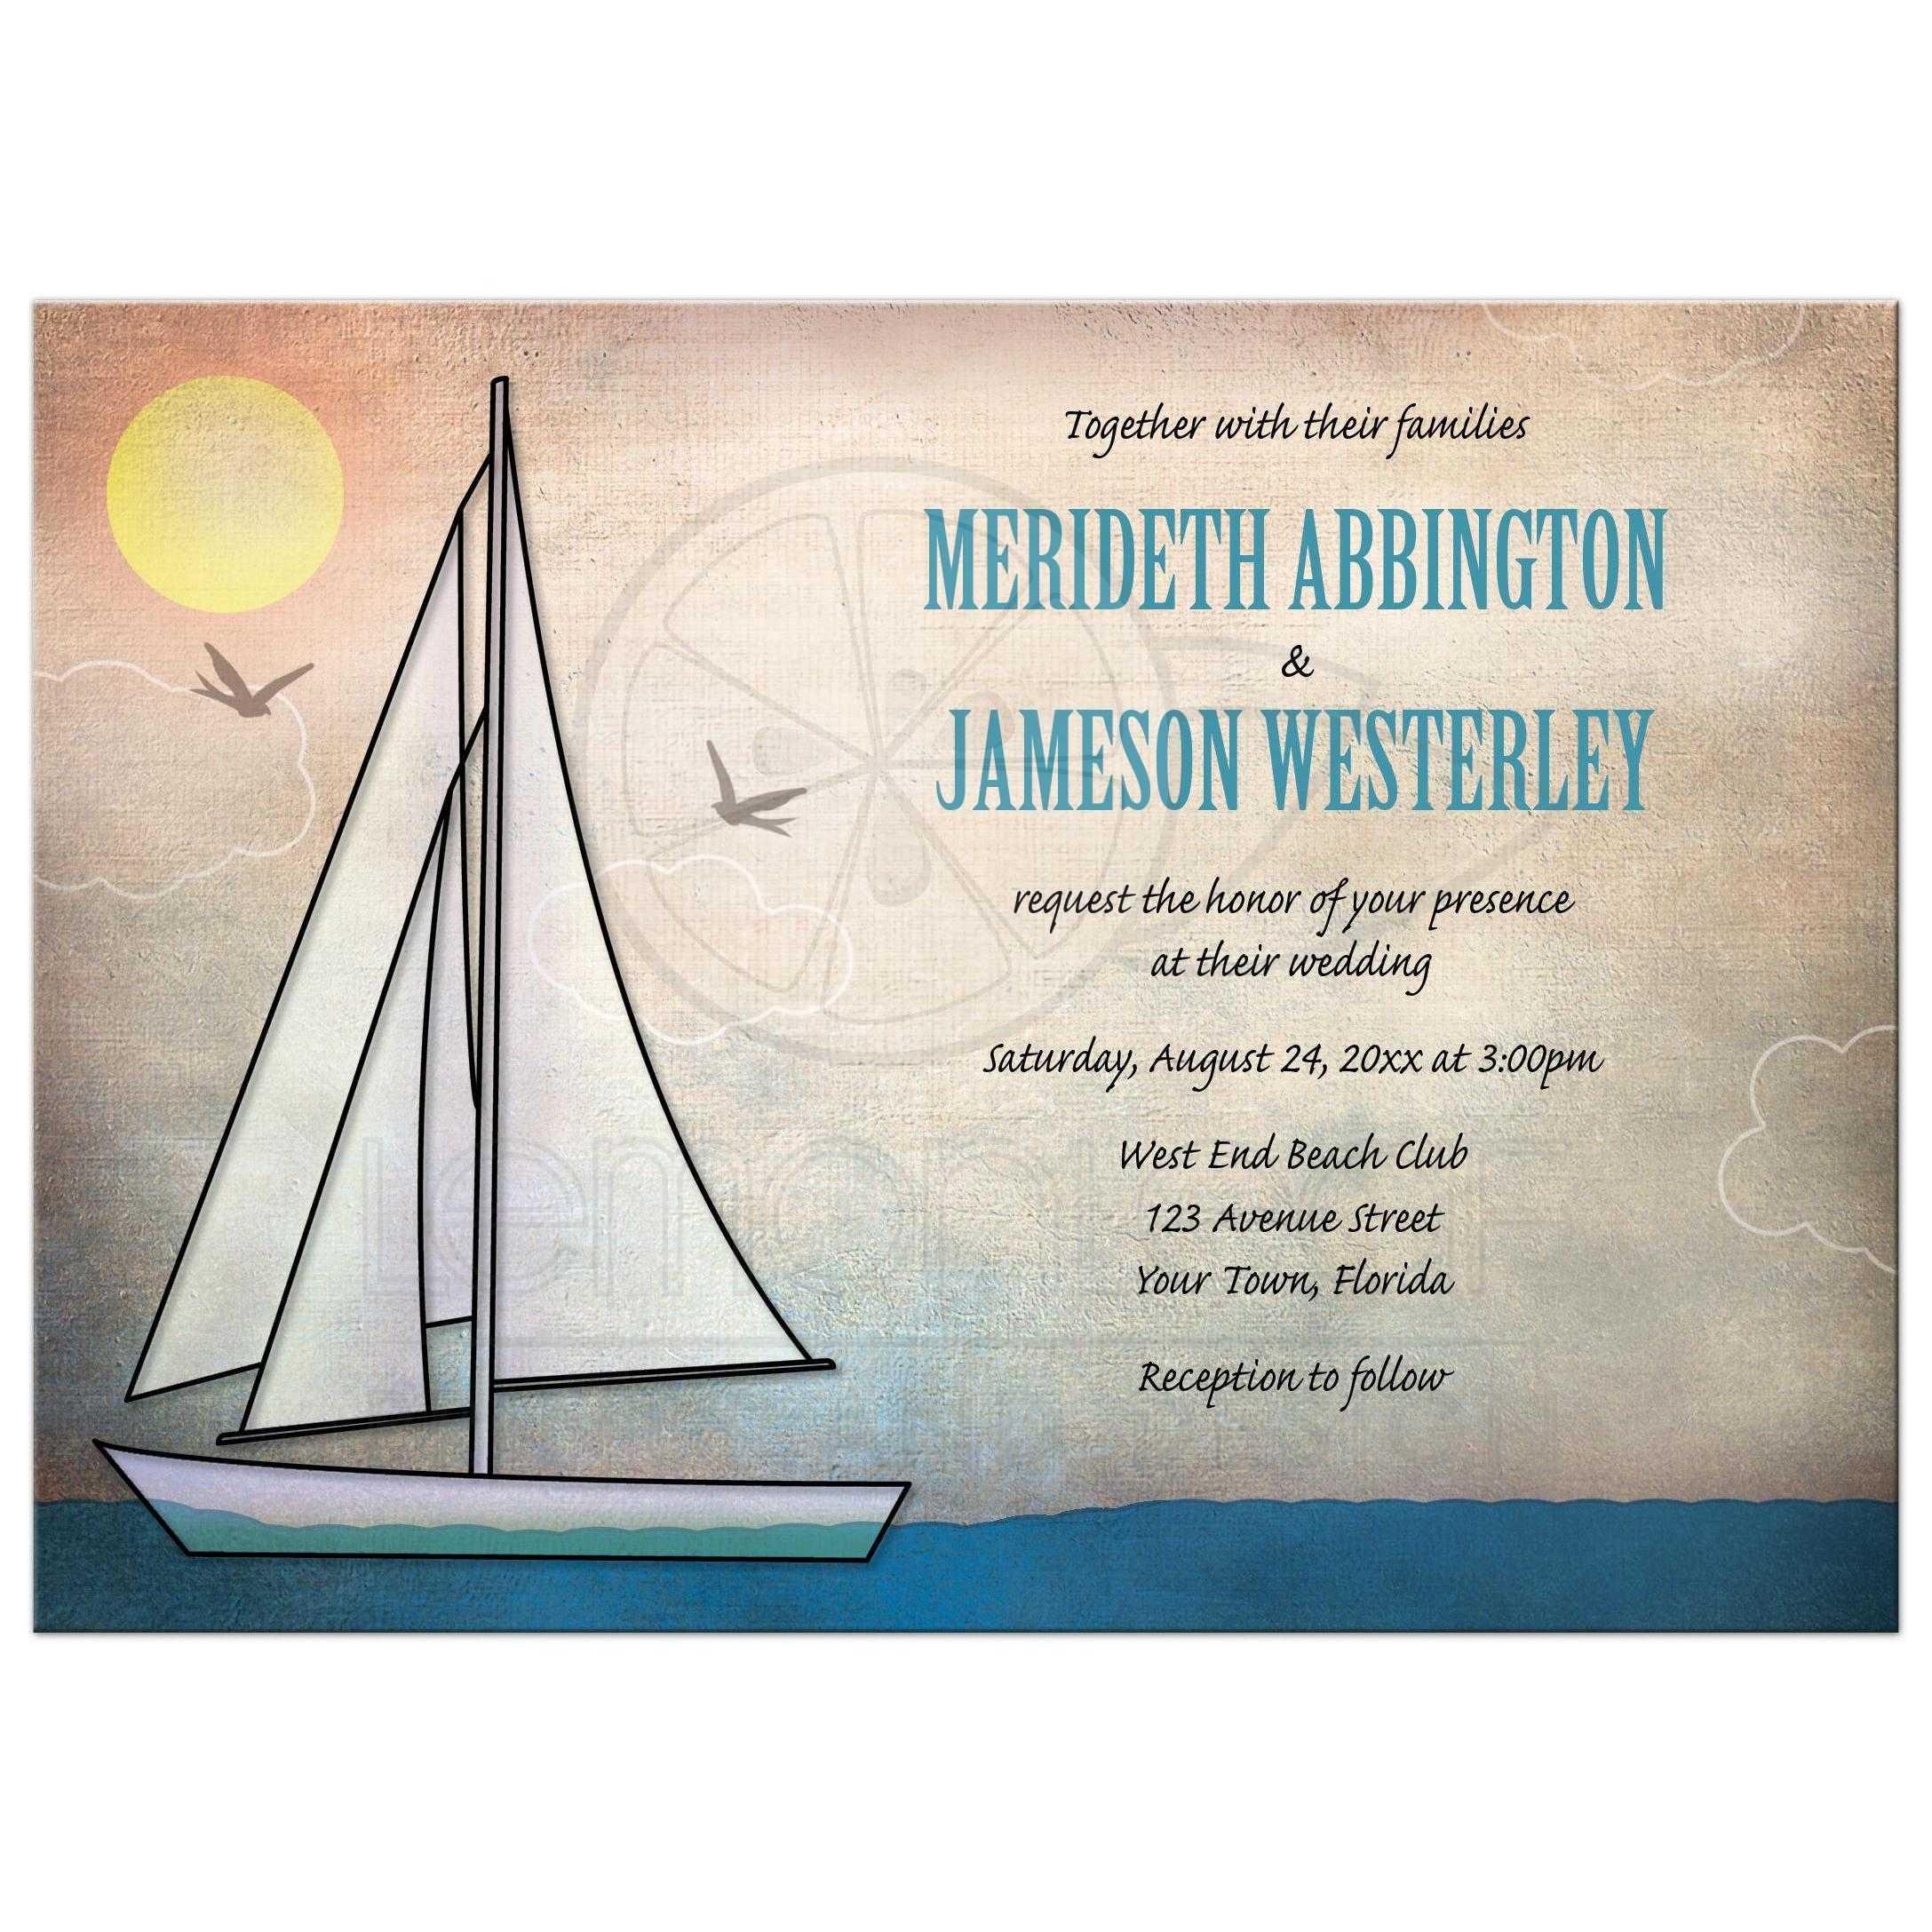 Nautical Themed Wedding Invitations: Rustic Sailboat Nautical